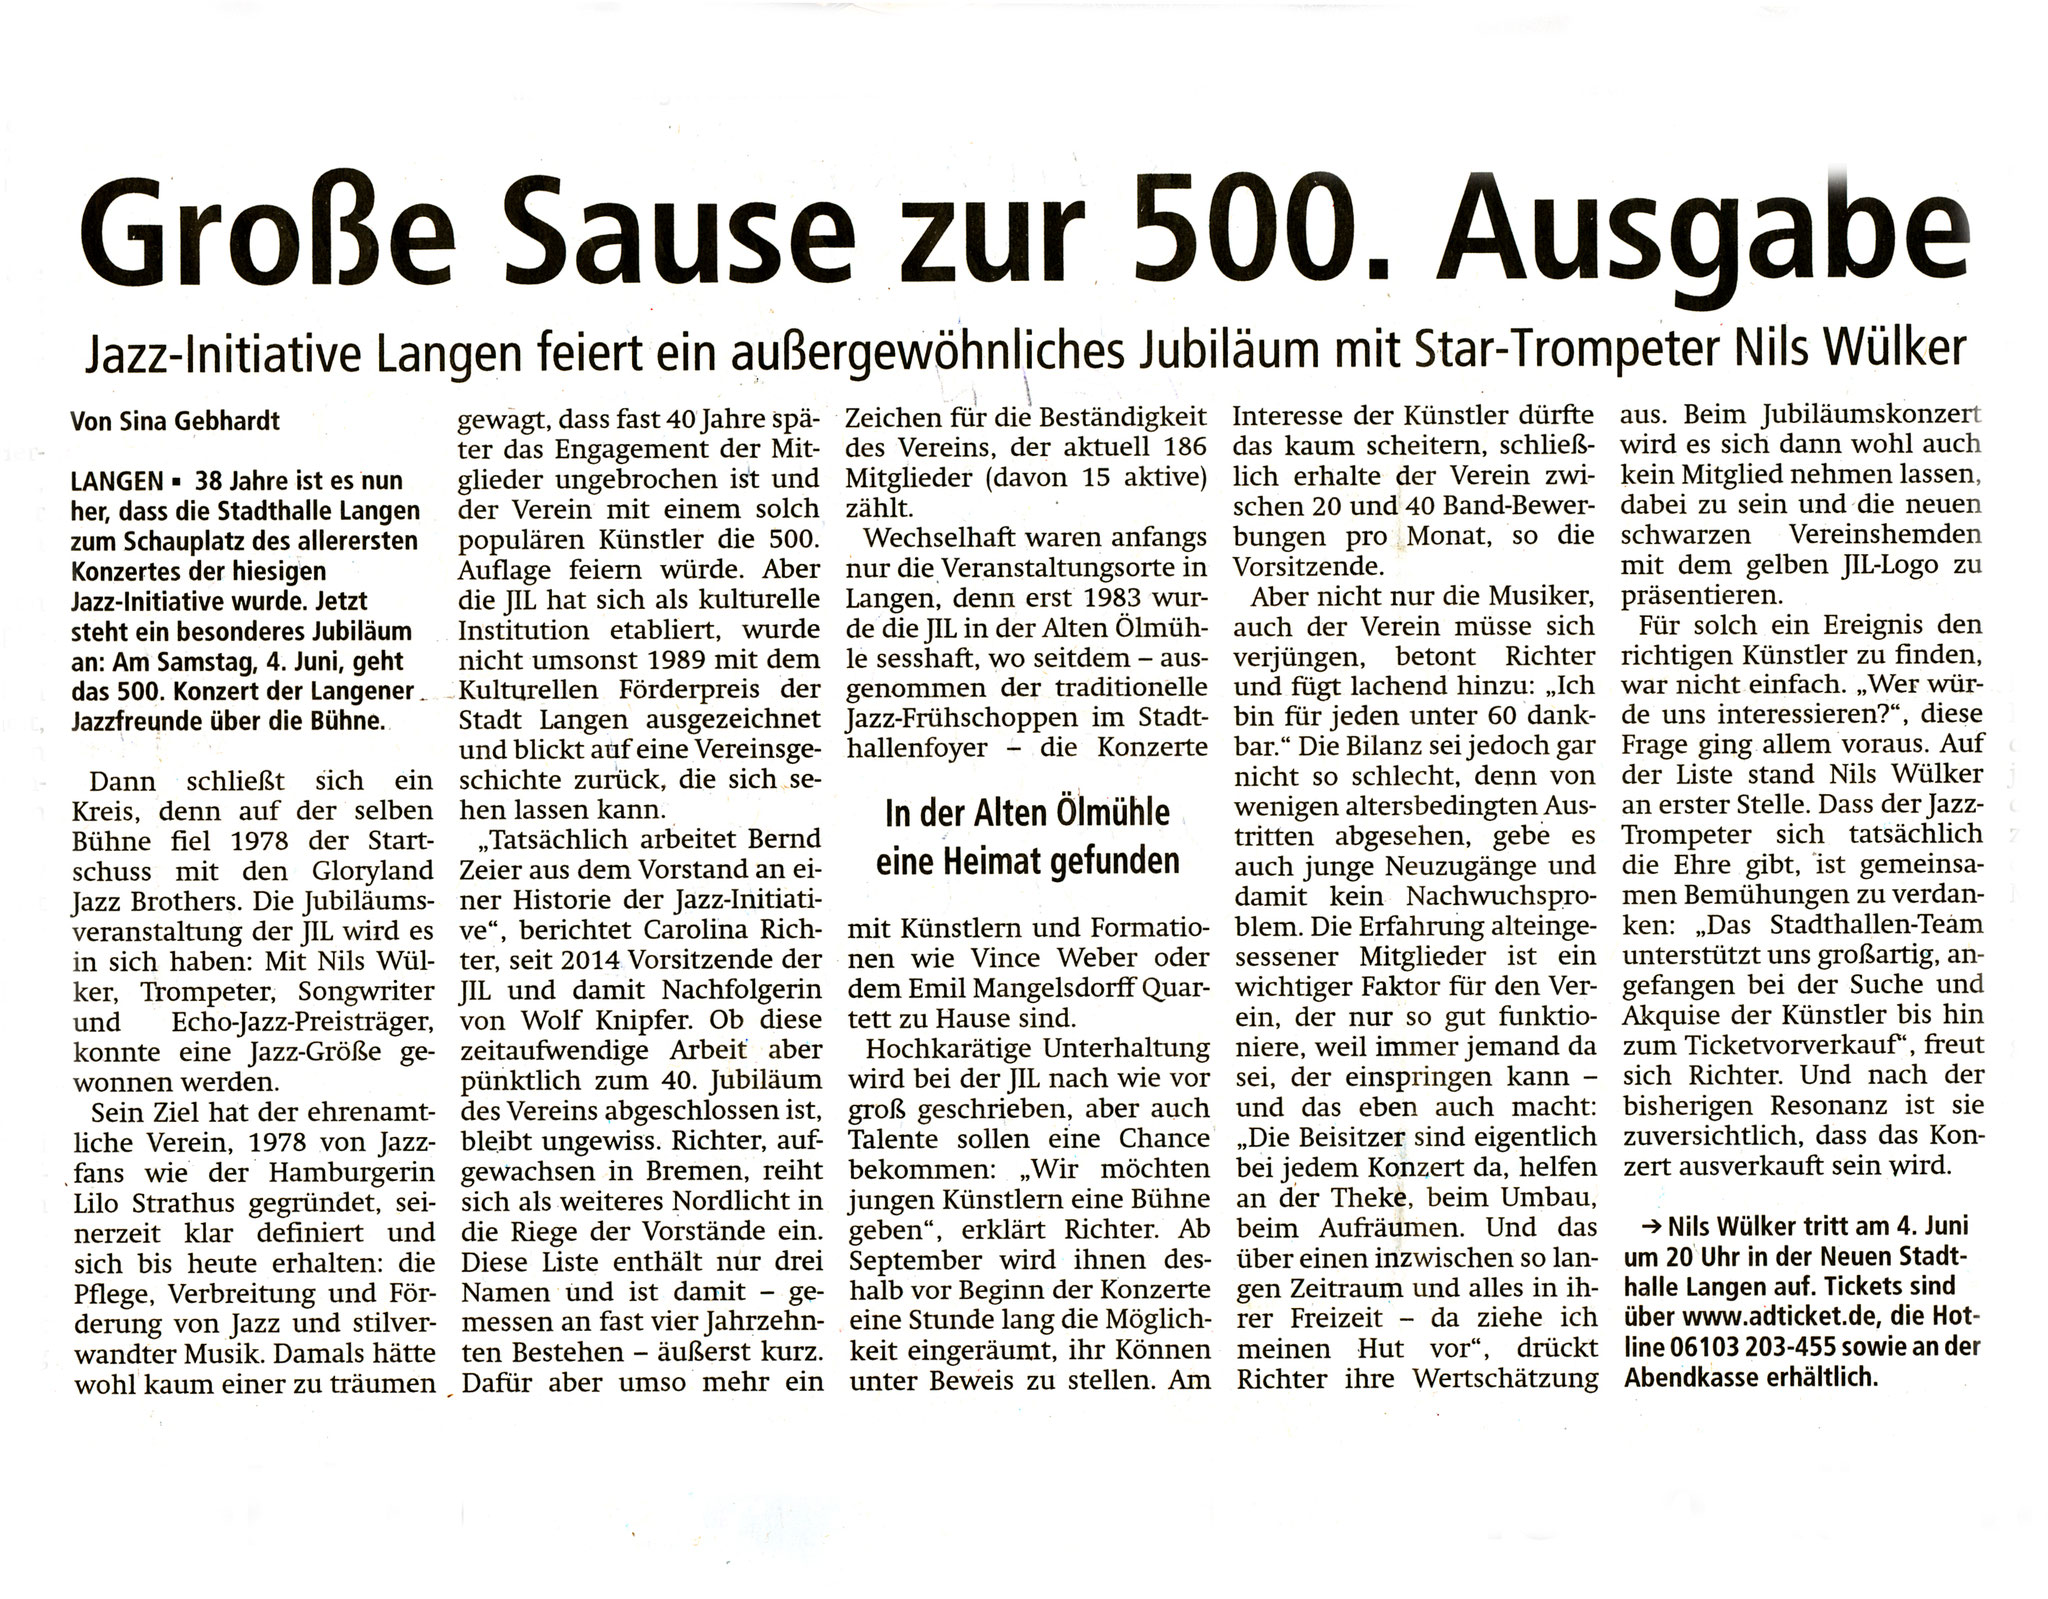 Offenbach Post, 26. Mai 2016